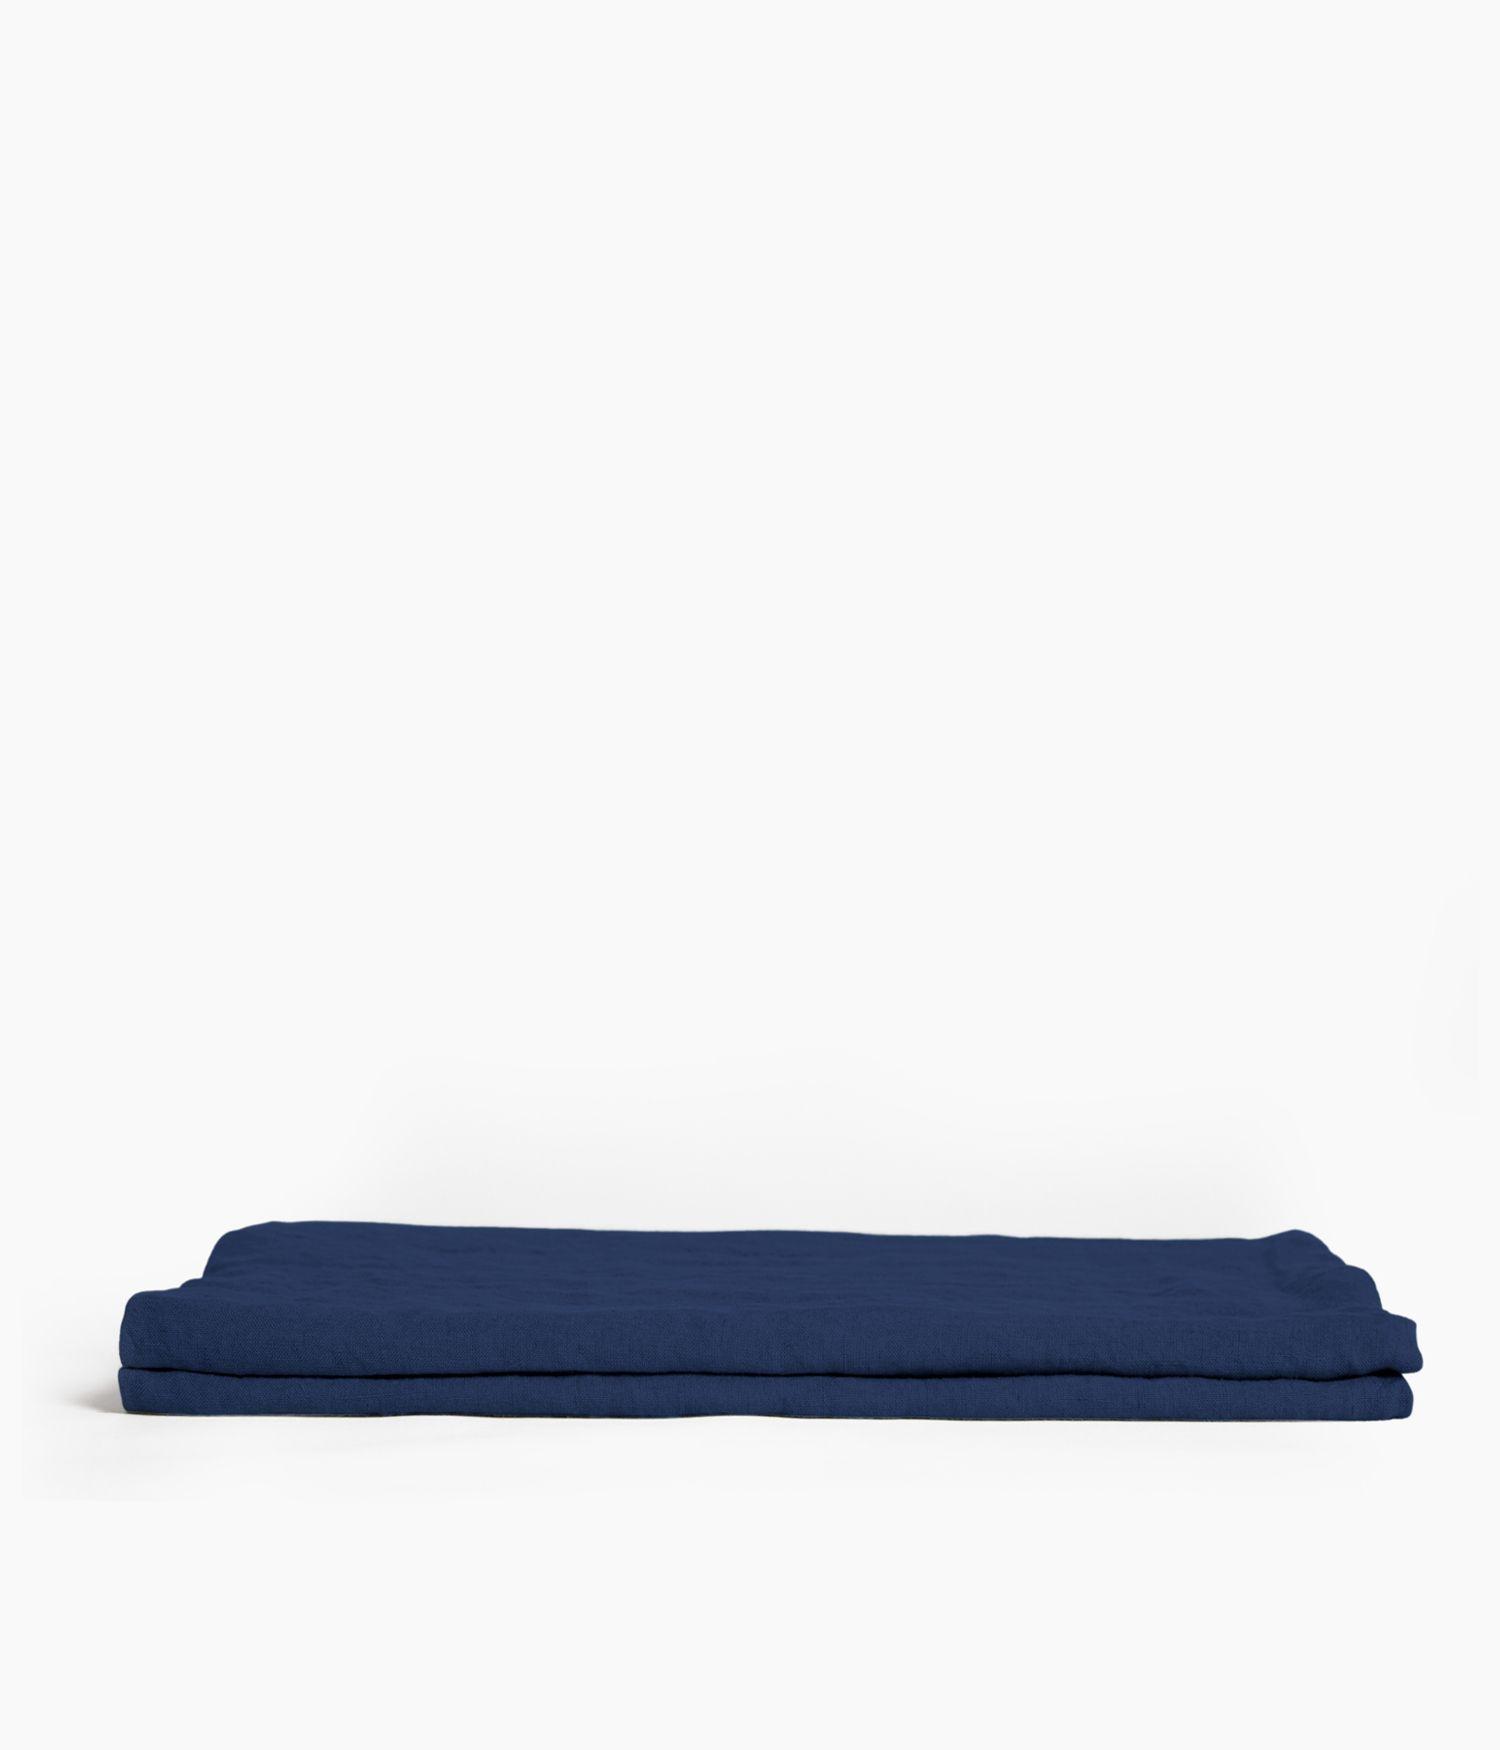 nappe rectangle 170*250 indigo